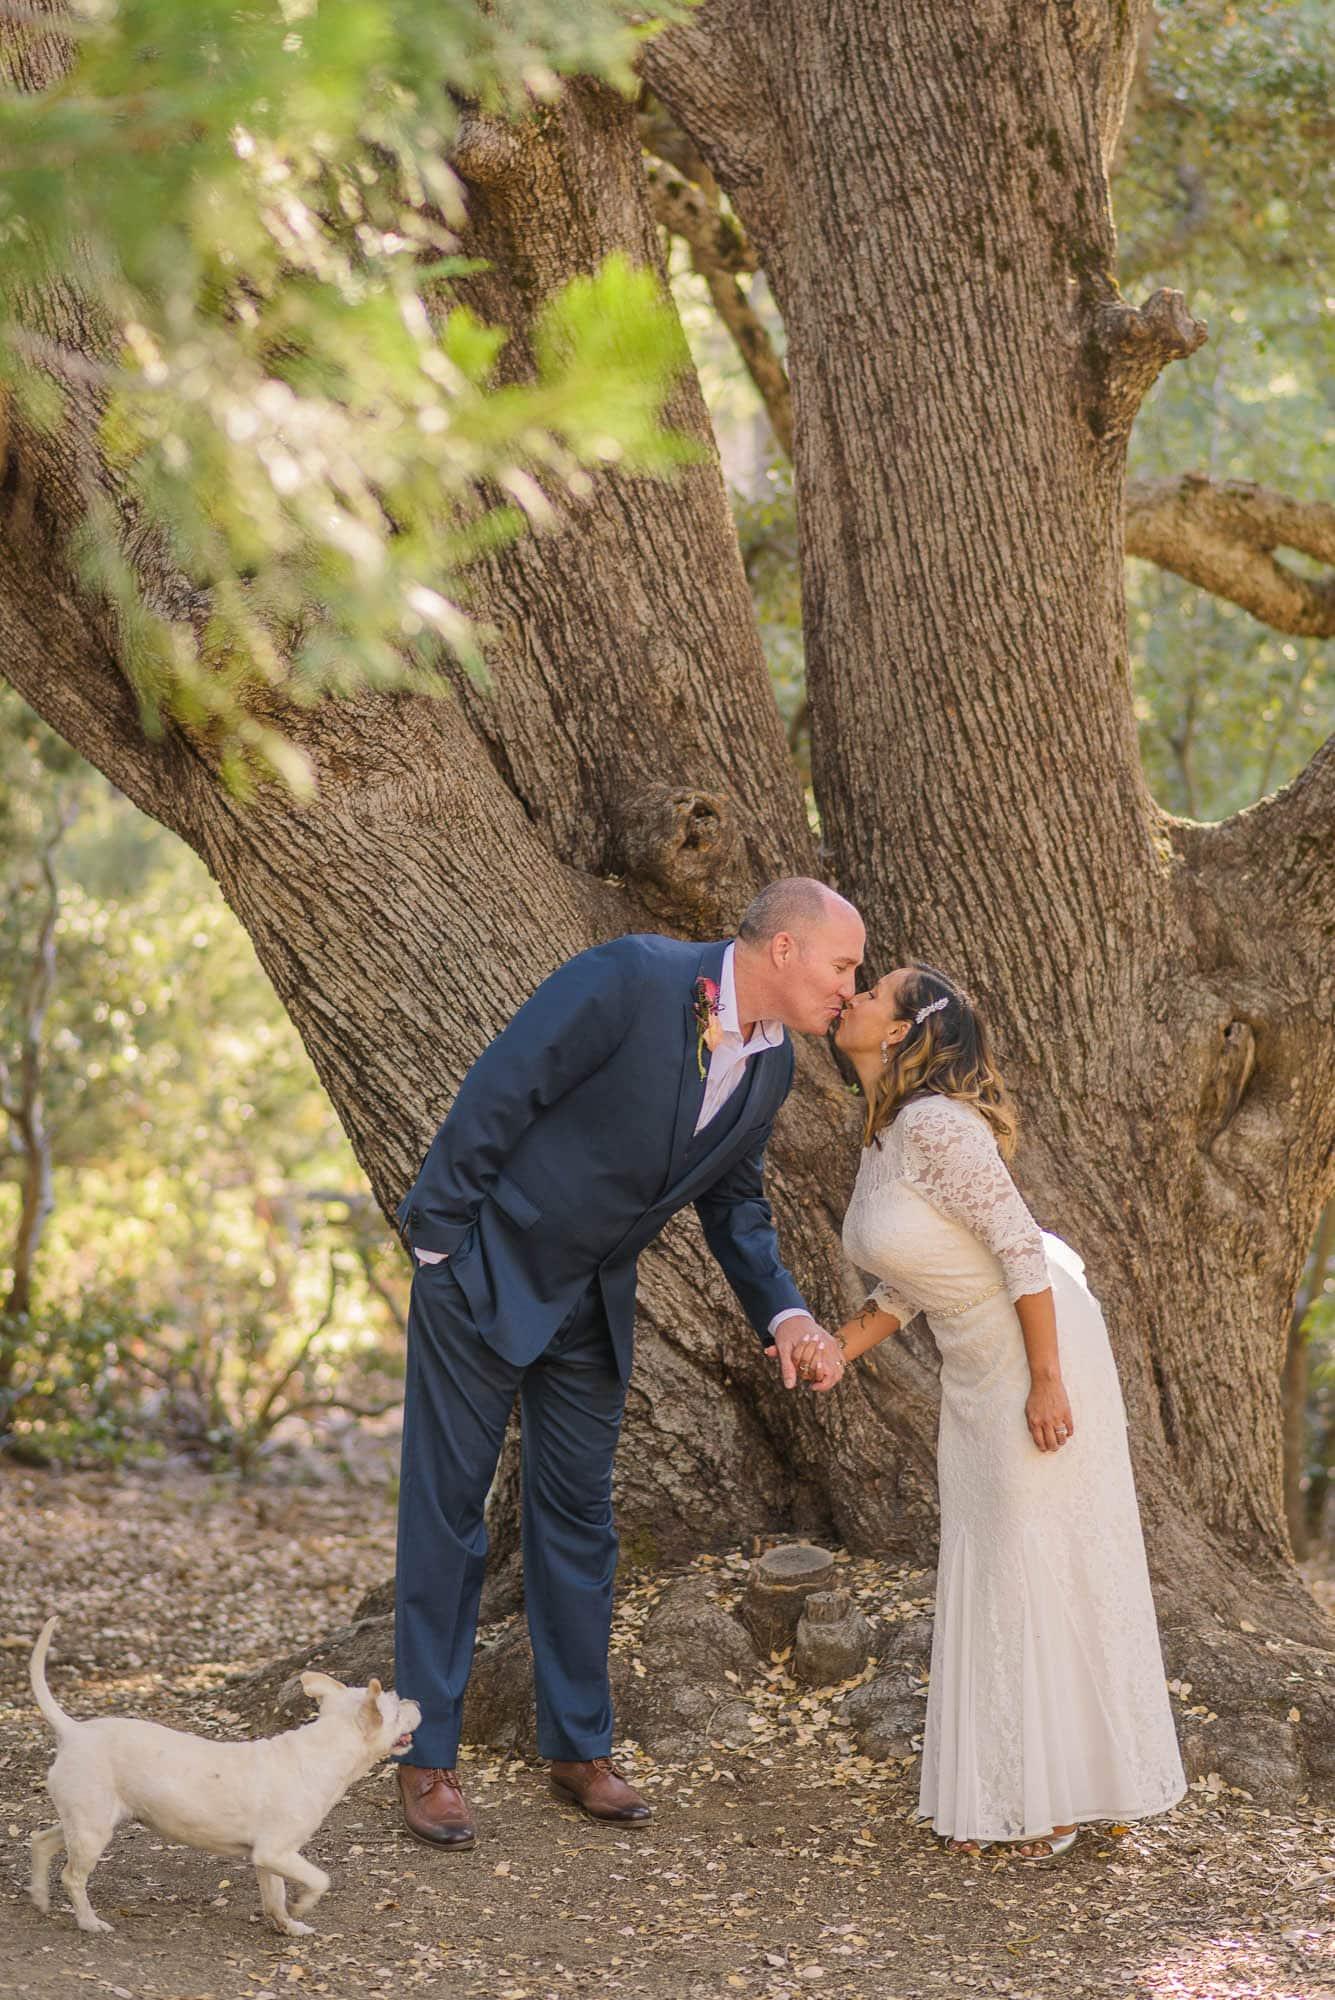 033_Alan_and_Heidi_Wedding_Jackie_Dannon